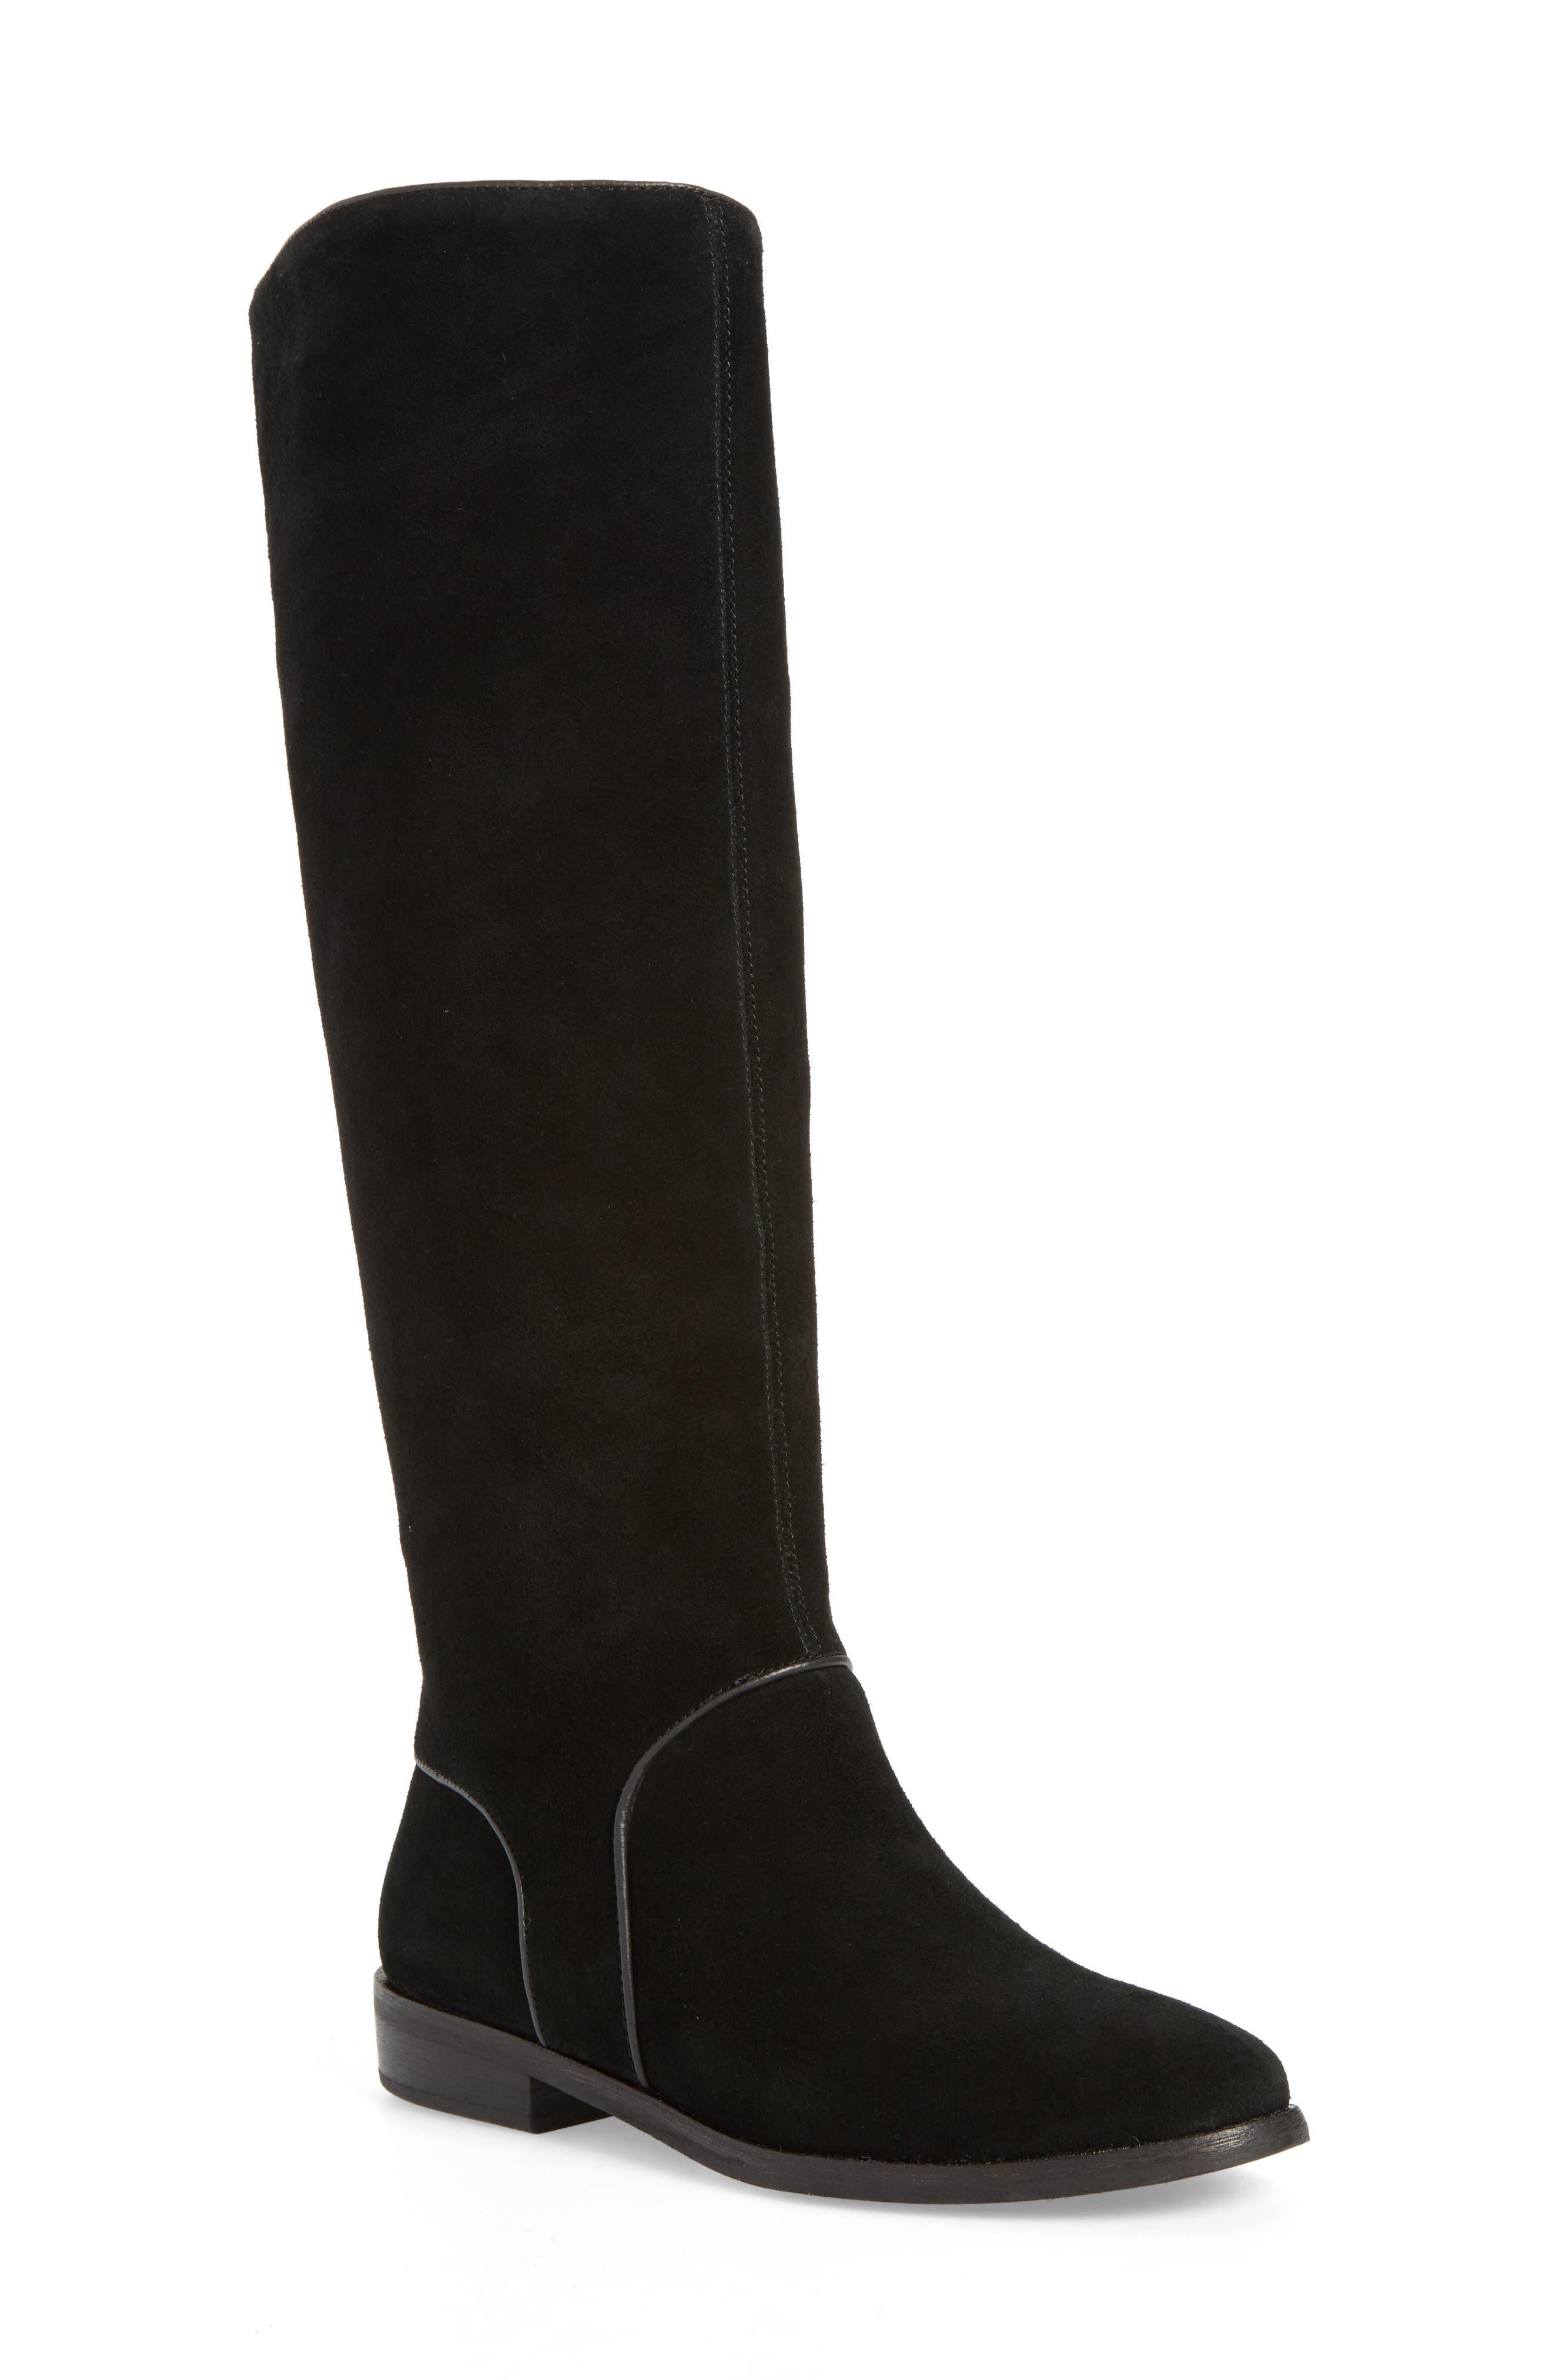 Gracen Knee High Boot,                         Main,                         color, Black Suede